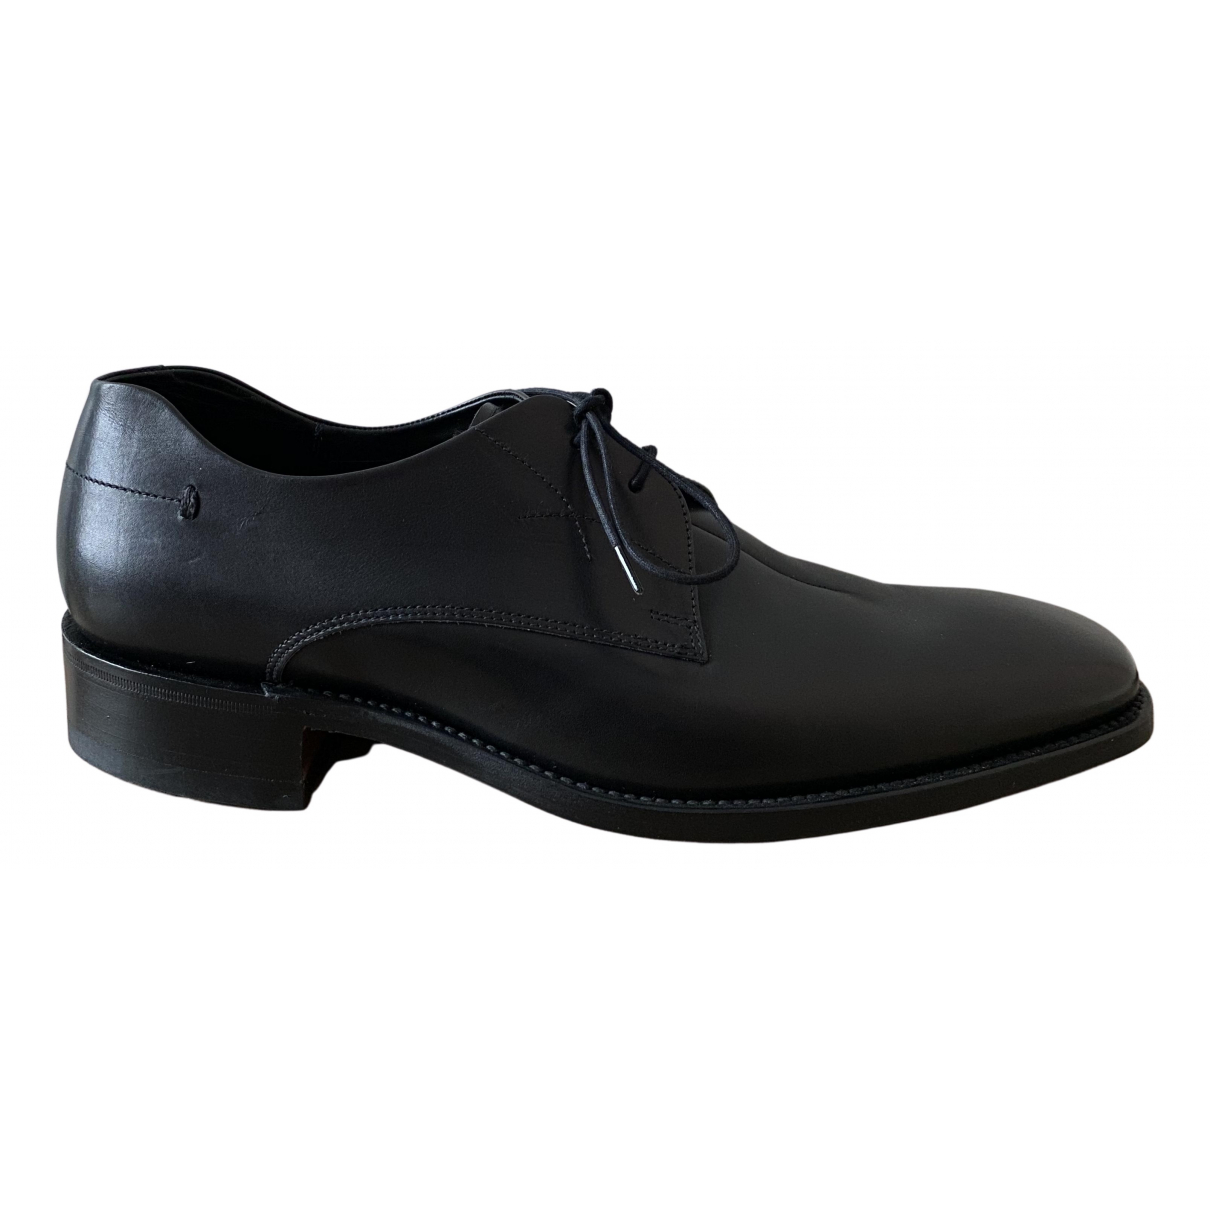 Loake \N Schnuerschuhe in  Schwarz Leder